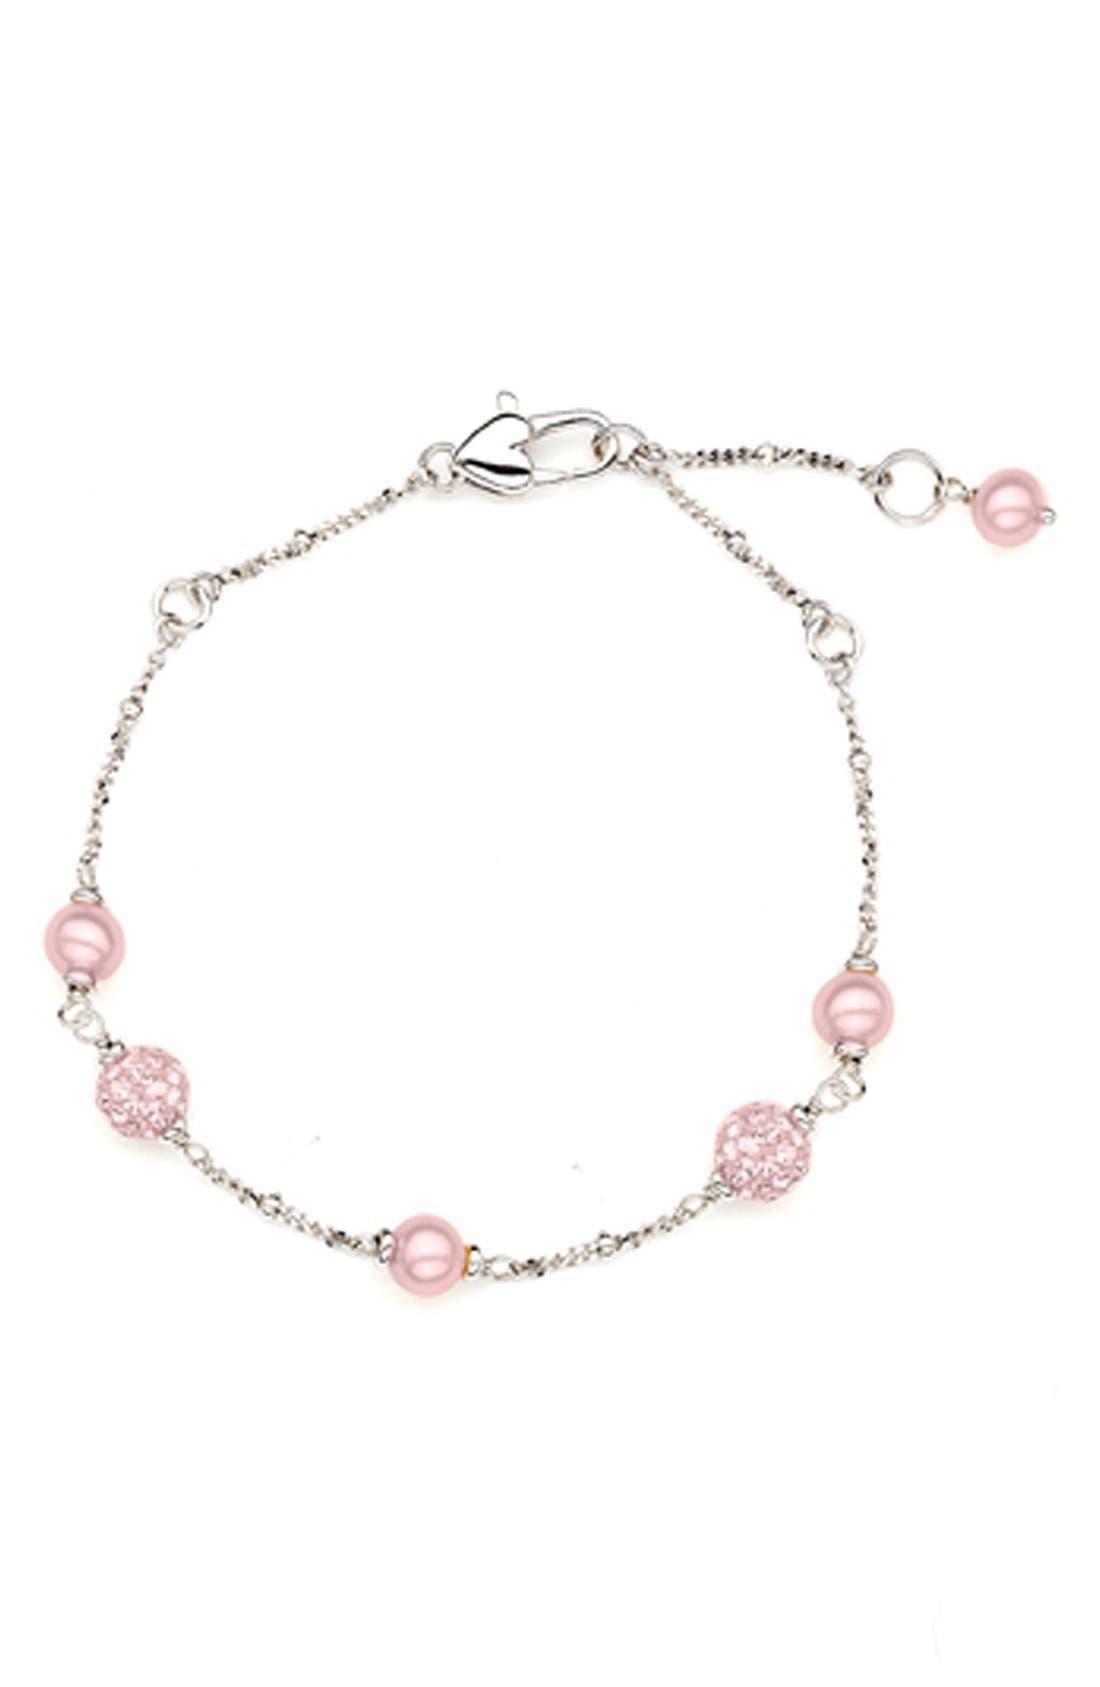 Alternate Image 1 Selected - HONORA Crystal & Freshwater Pearl Station Bracelet (Girls)